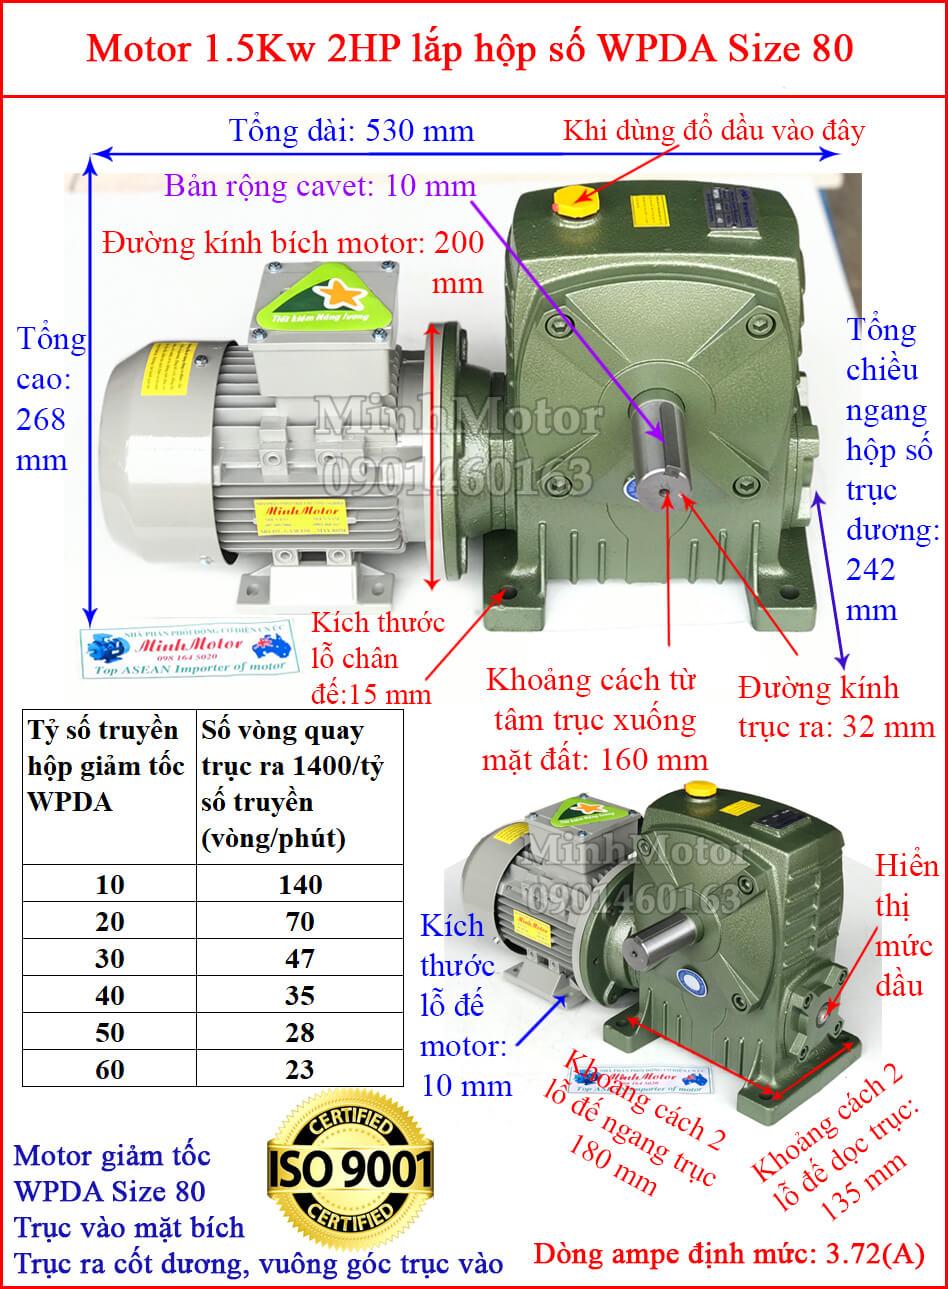 Hộp số WPDA size 80 liền motor